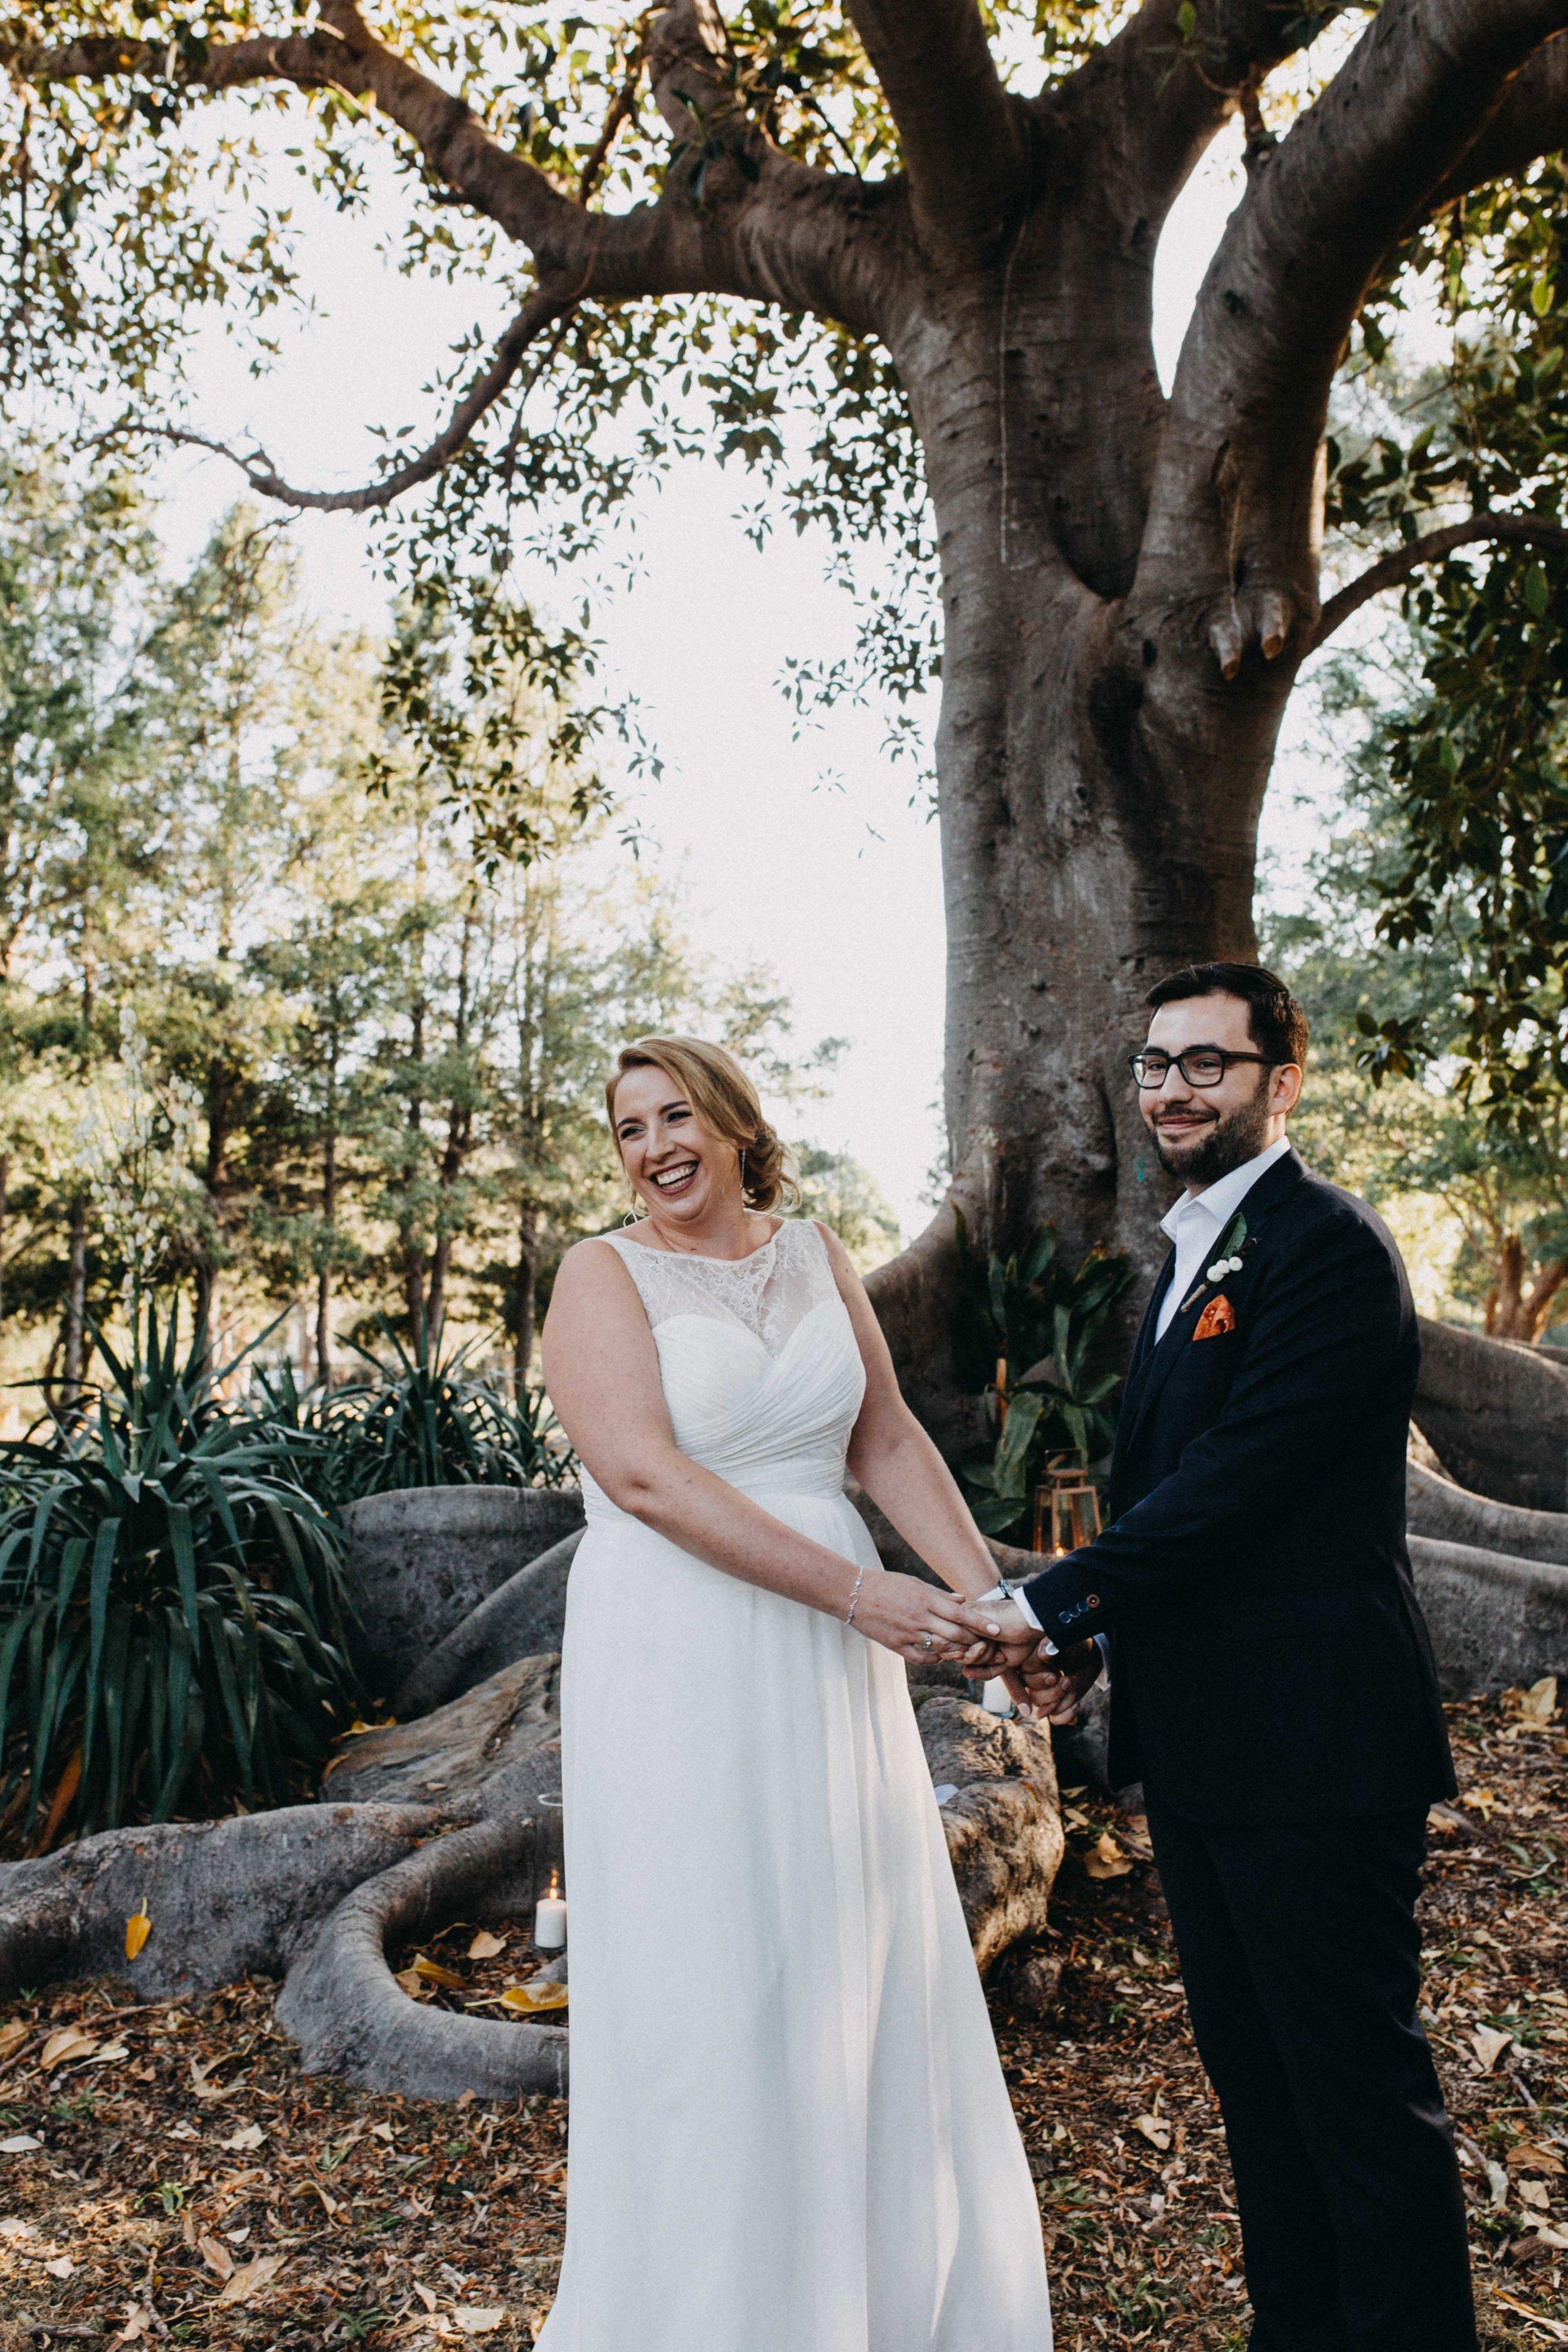 cabarita-park-sydney-wedding-emilyobrienphotography.net-27.jpg